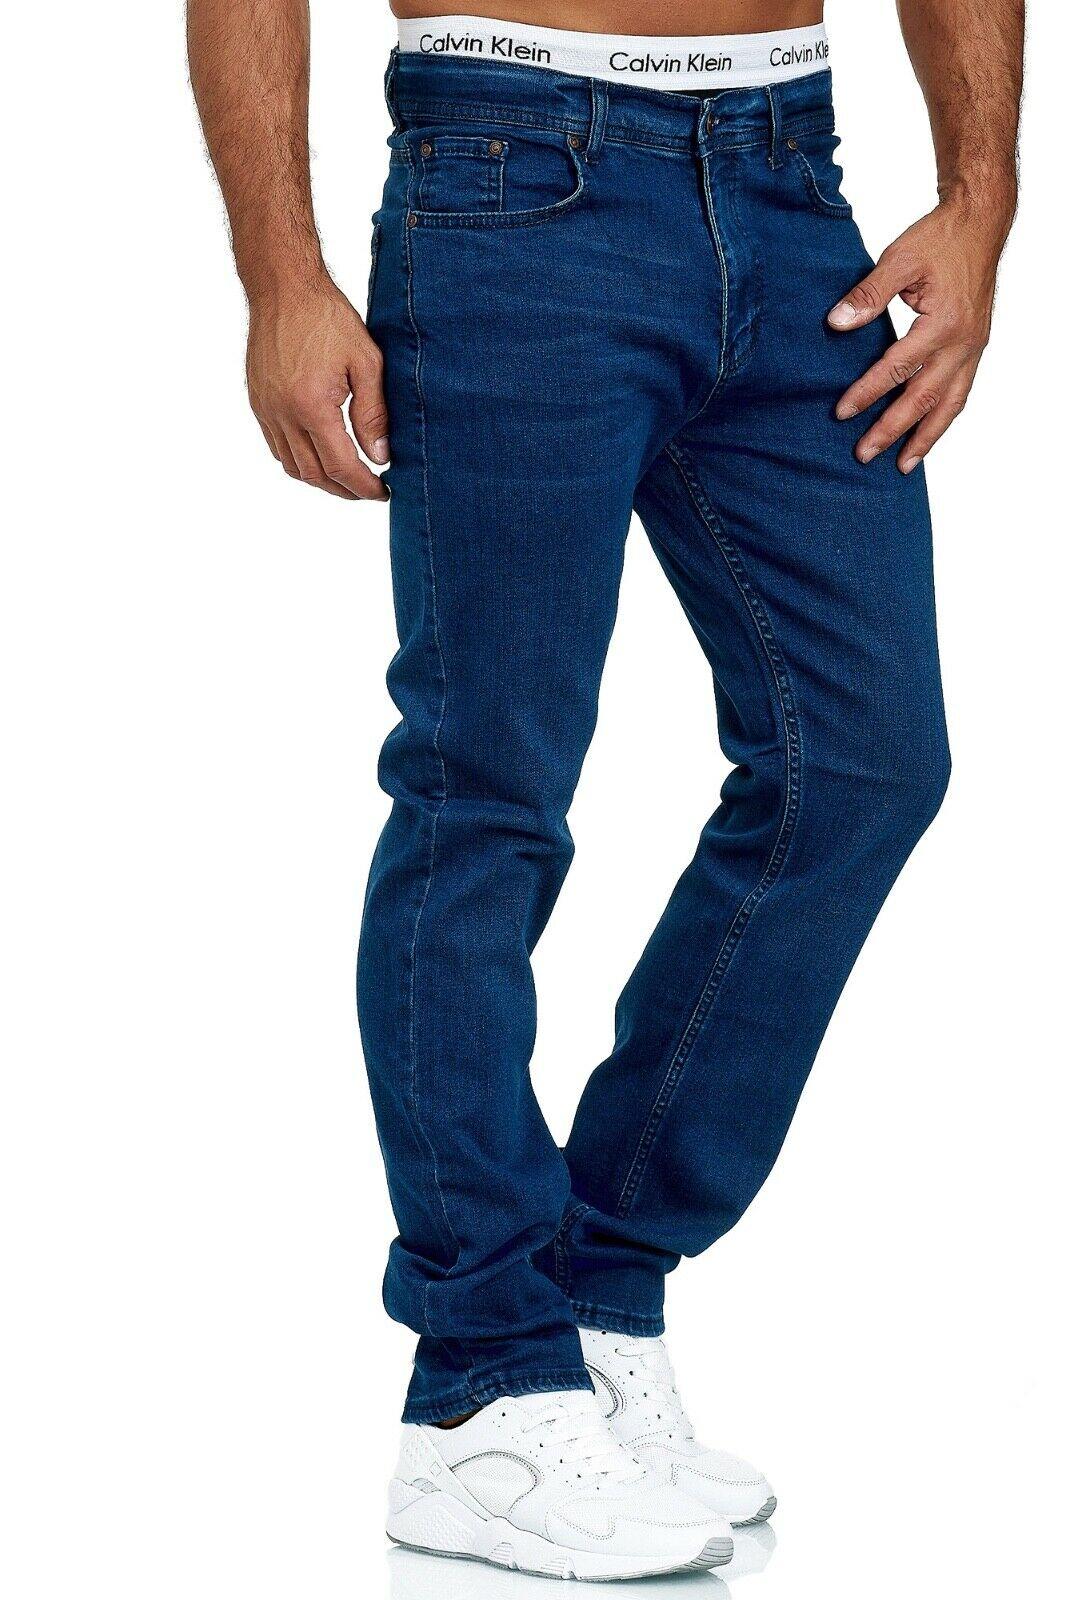 Herren-Jeans-Hose-Denim-KC-Black-Washed-Straight-Cut-Regular-Dicke-Naht-naehte Indexbild 33